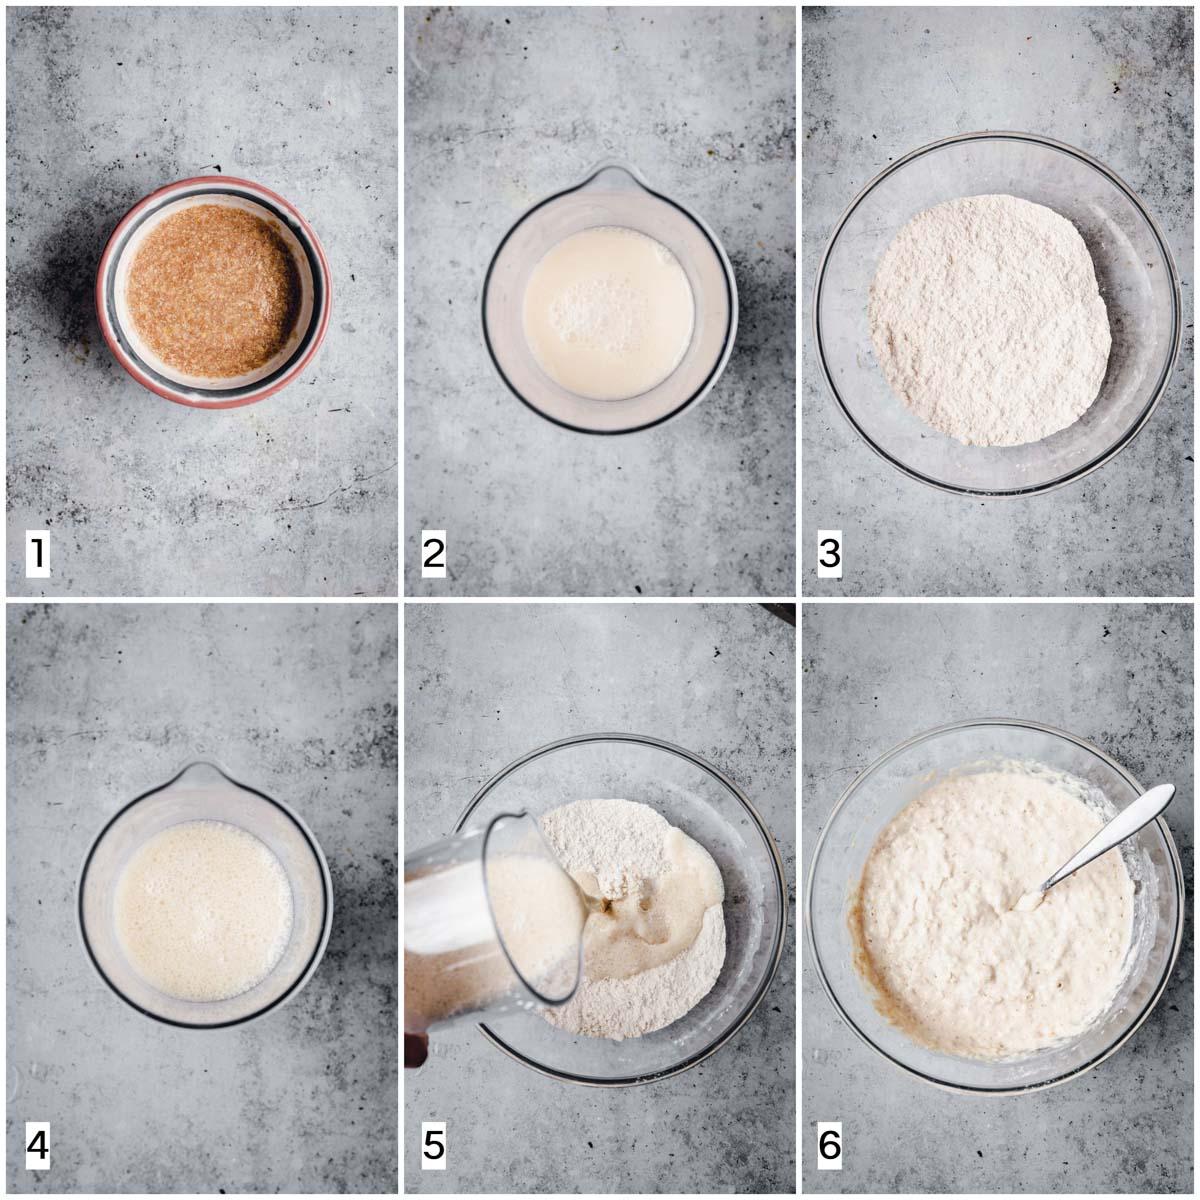 The six steps in making almond milk vegan waffles.